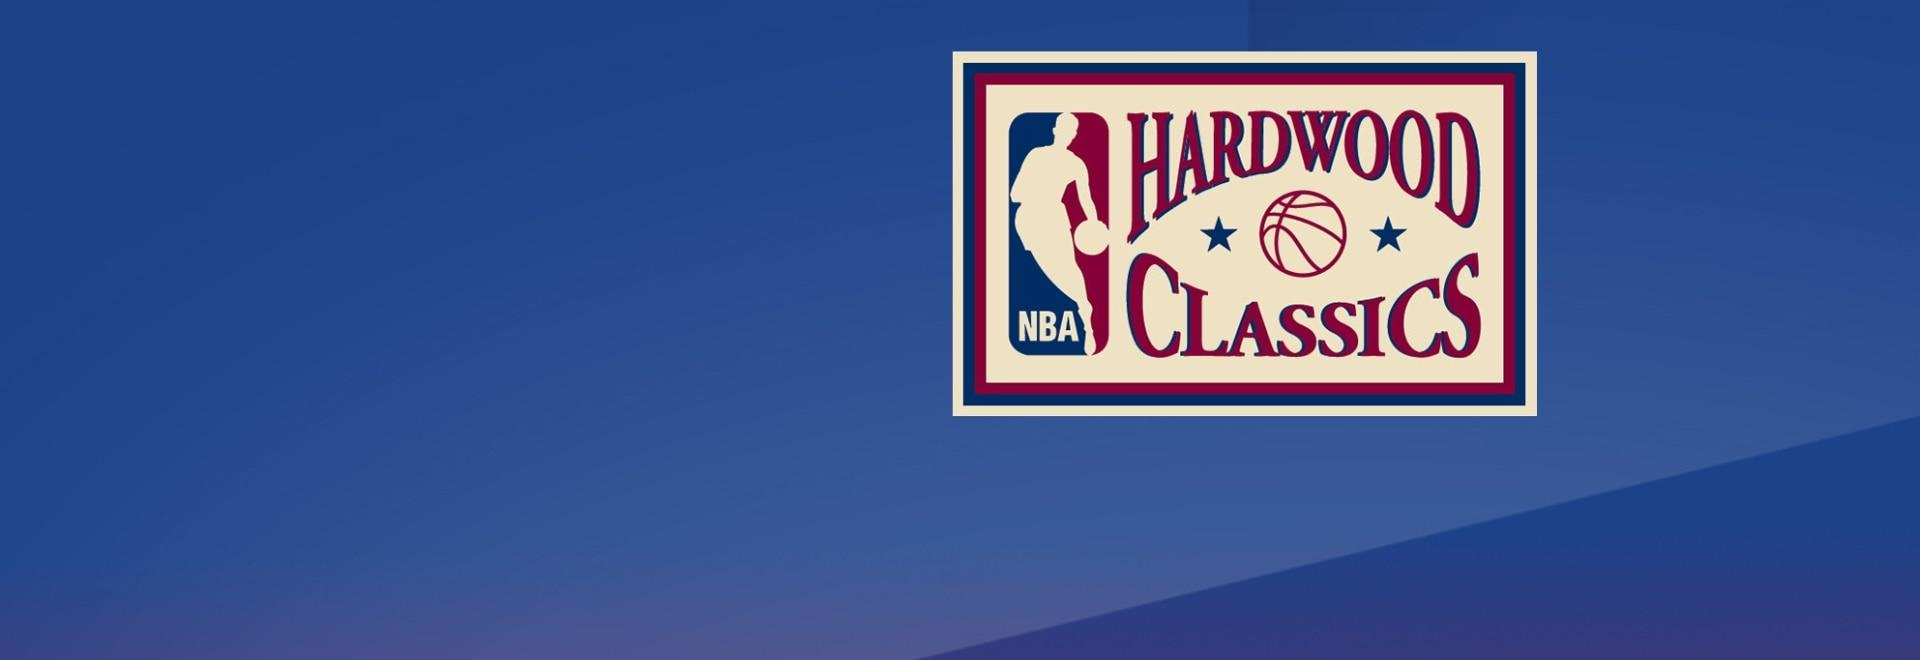 Knicks - Nets 1983. 1st Round Game 1